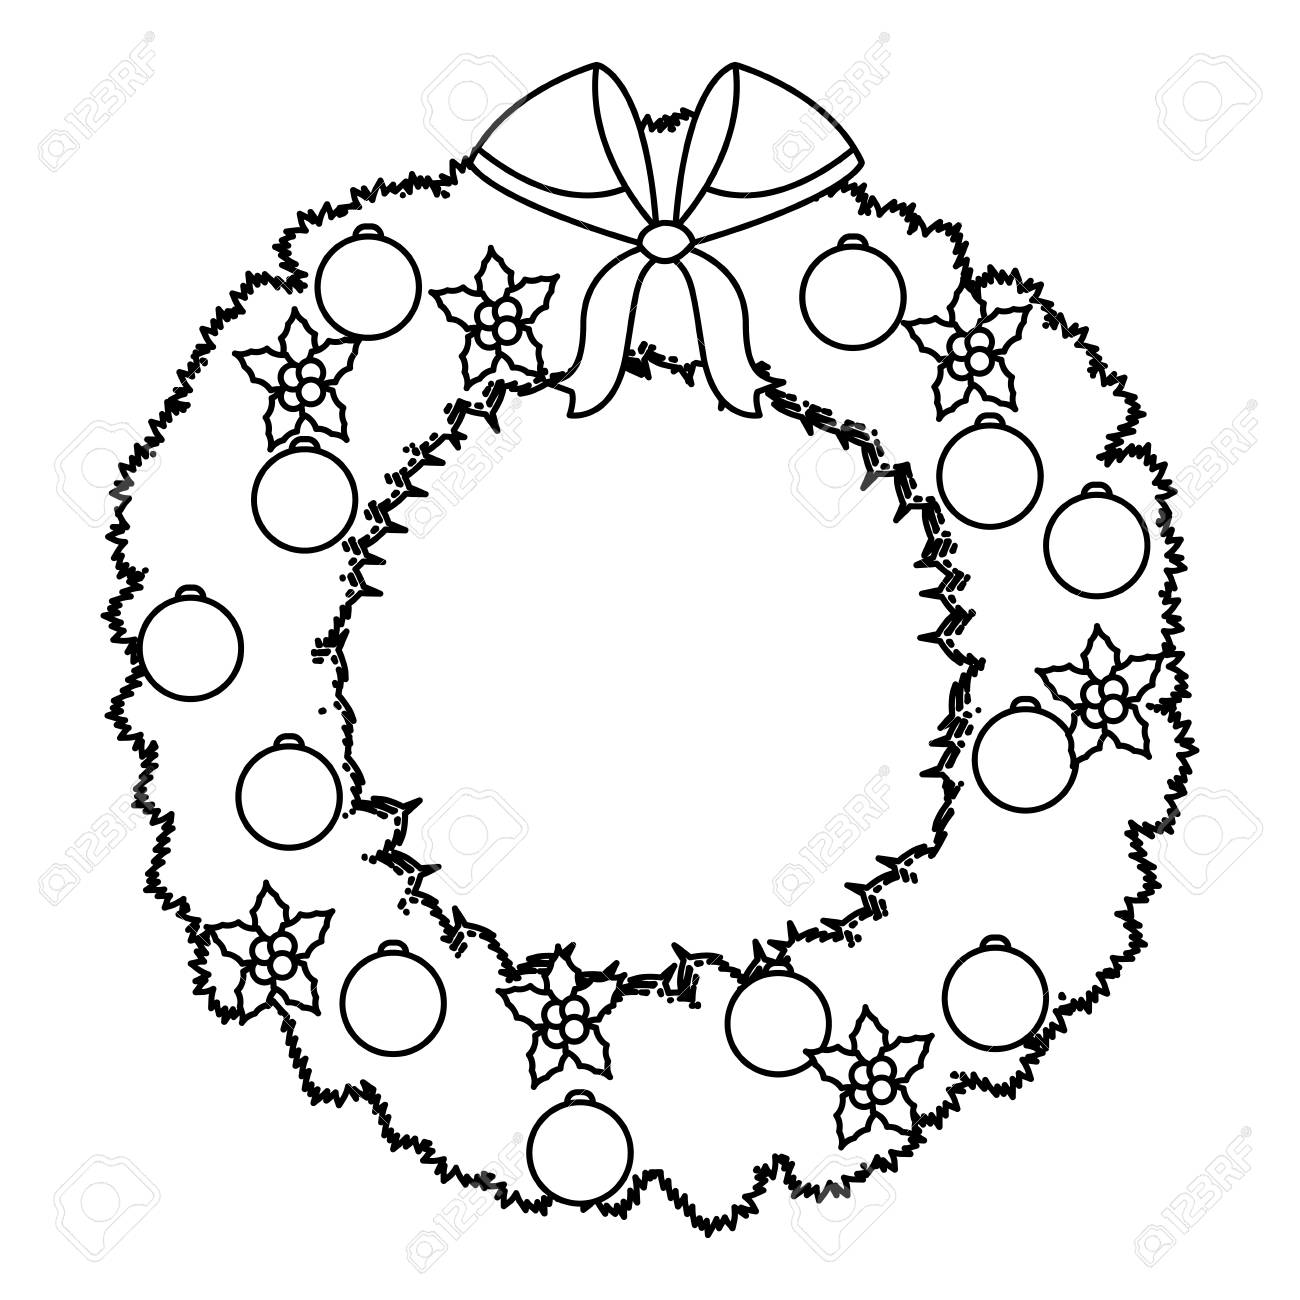 Christmas Wreath Flower Bow Ball Decoration Outline Vector Illustration Stock